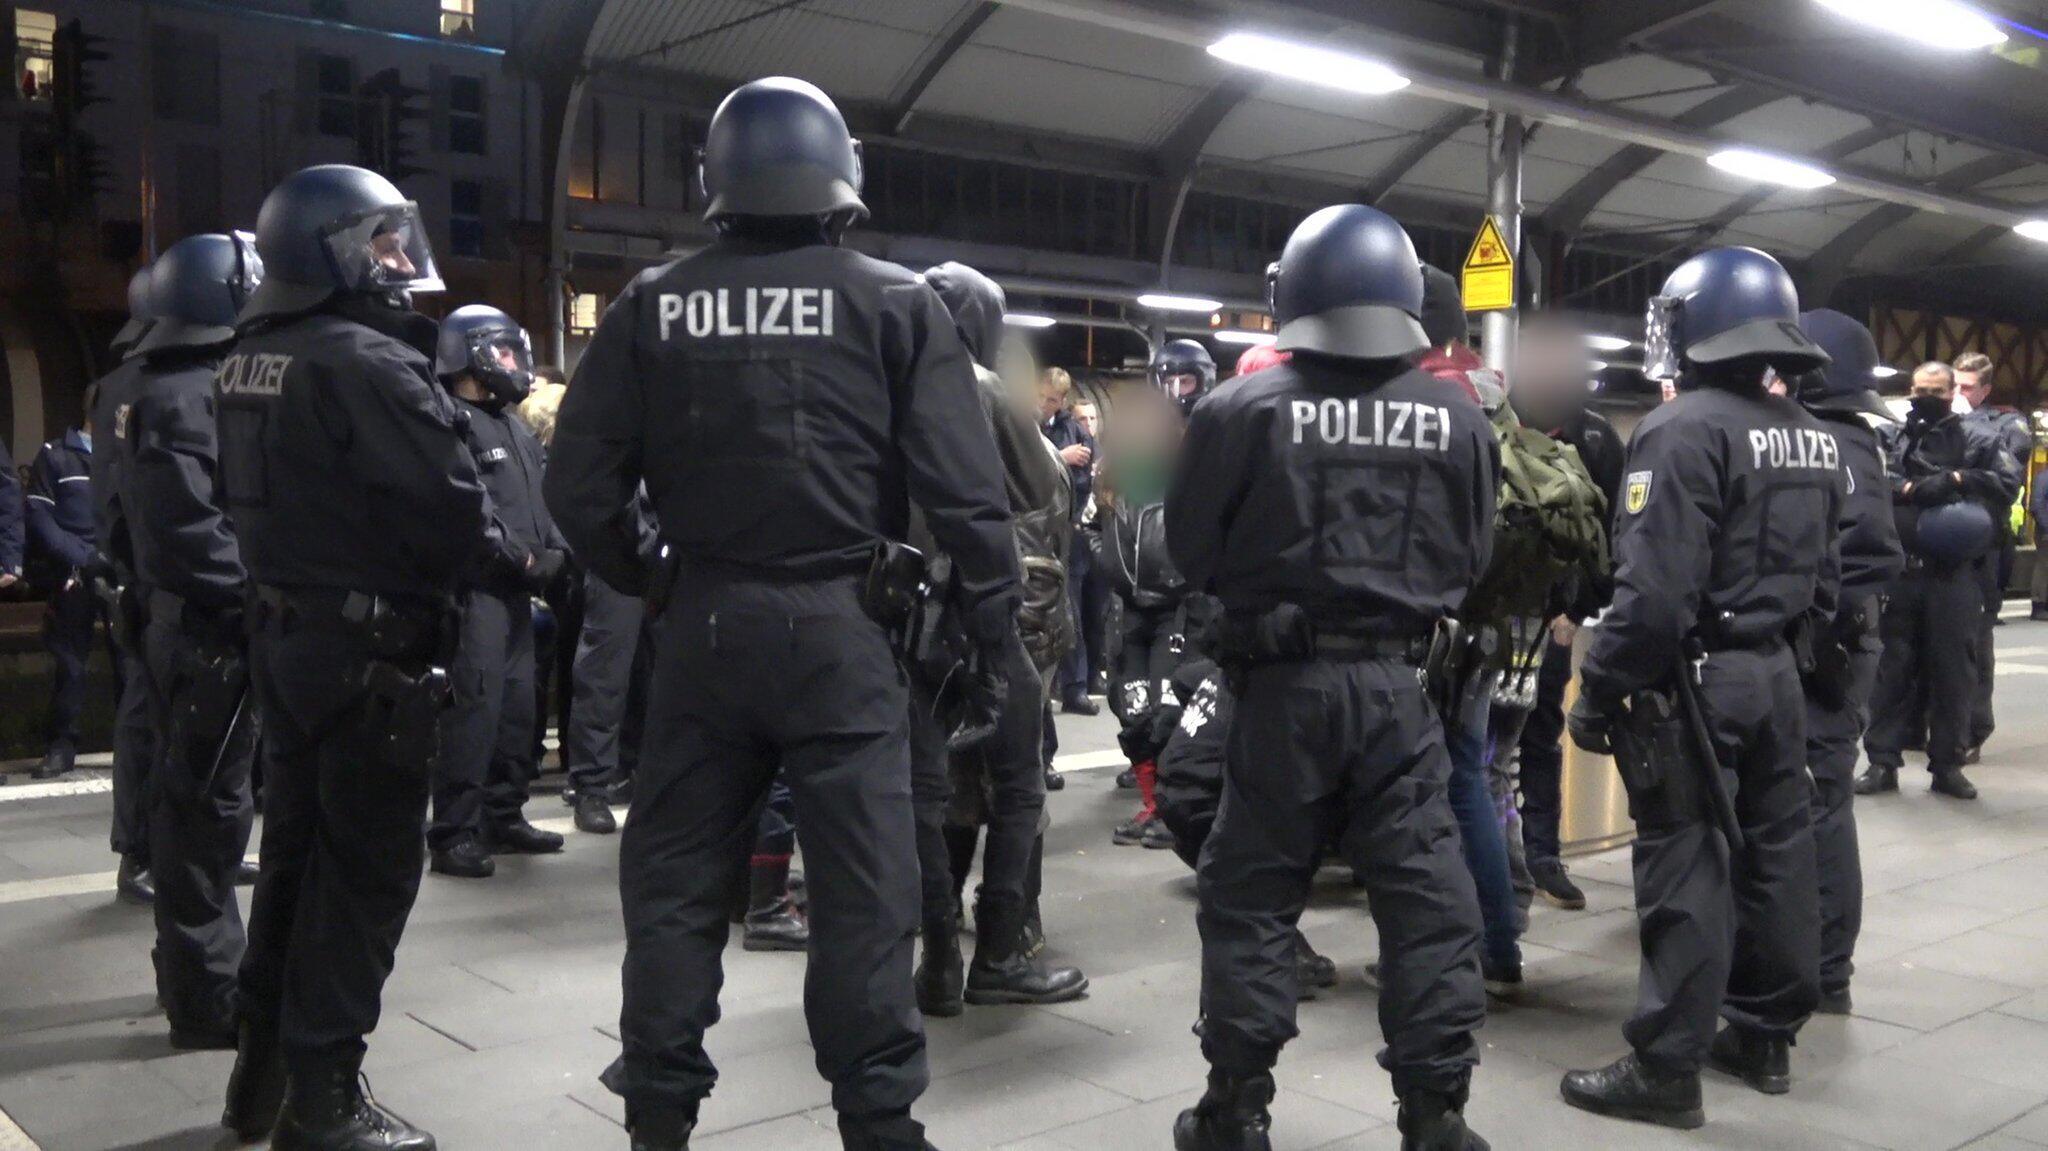 Bild zu Massenschlägerei nach Neonazi-Demo - Bonner Bahnhof kurz gesperrt